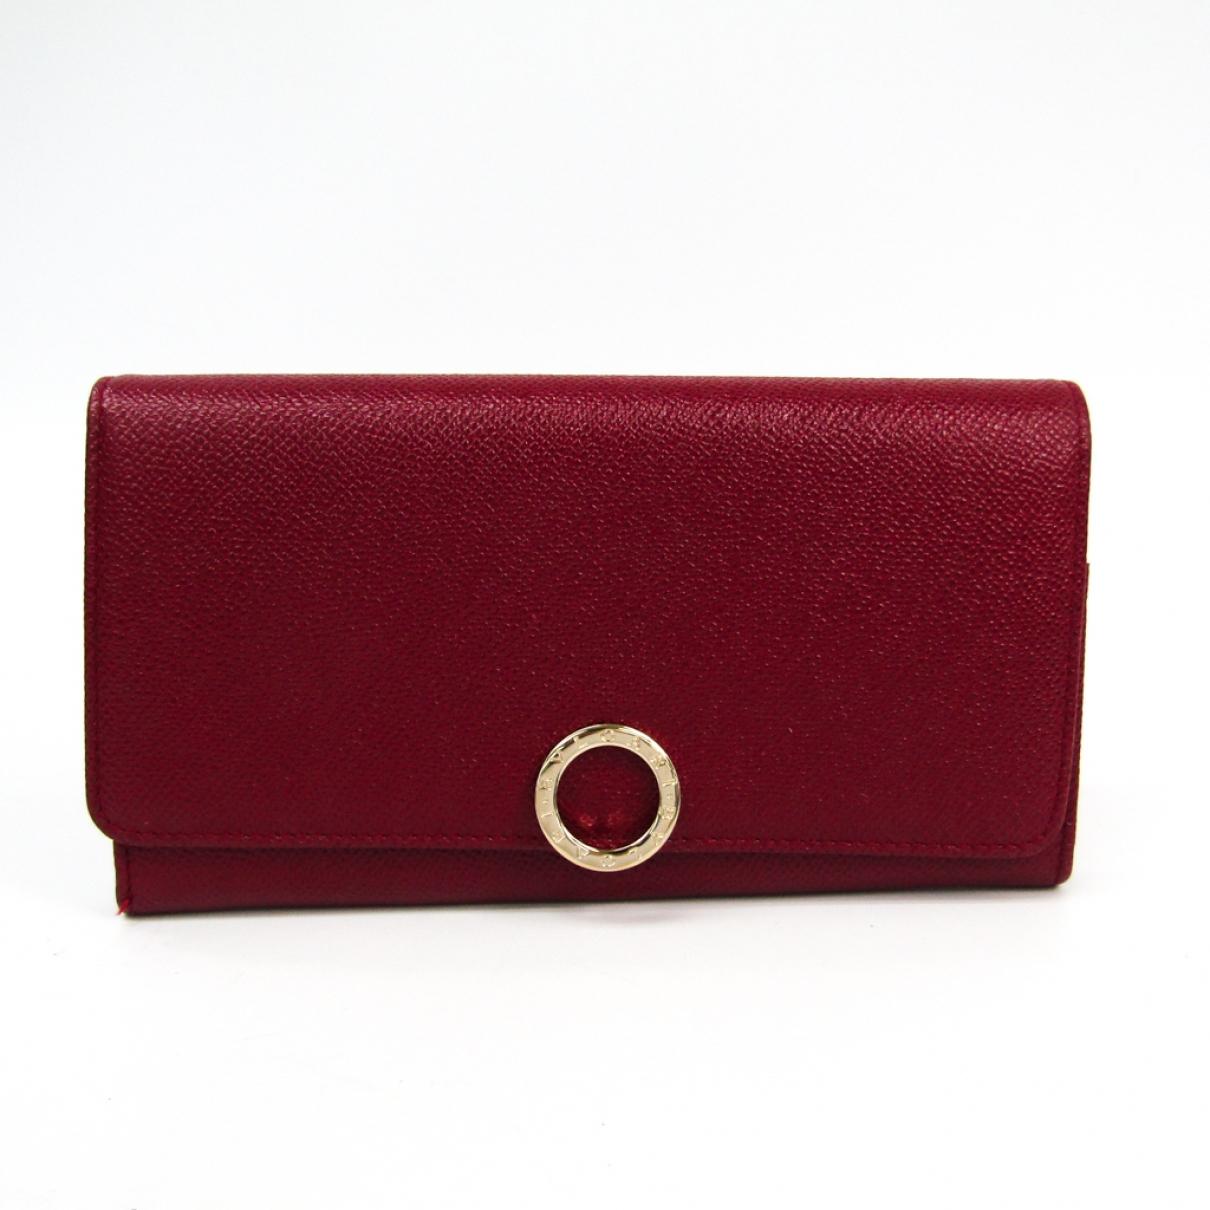 Bvlgari \N Red Leather wallet for Women \N